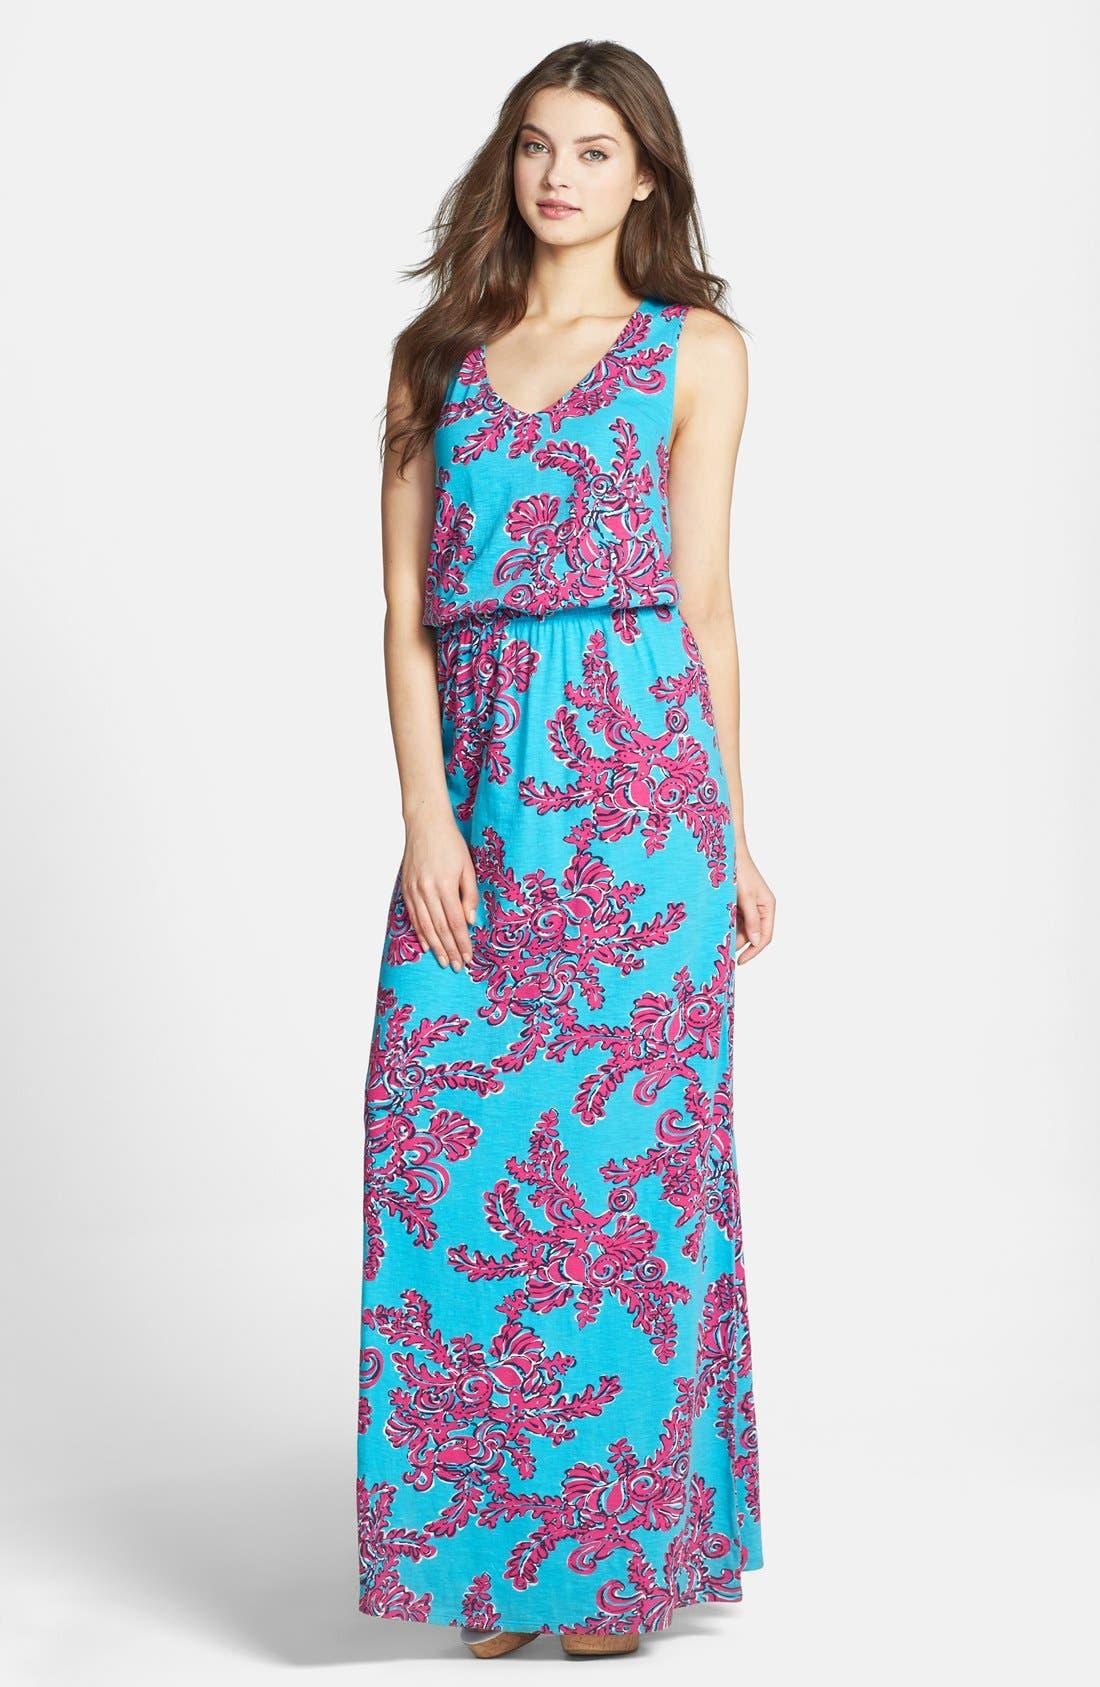 Main Image - Lilly Pulitzer® Print Blouson Cotton Maxi Dress